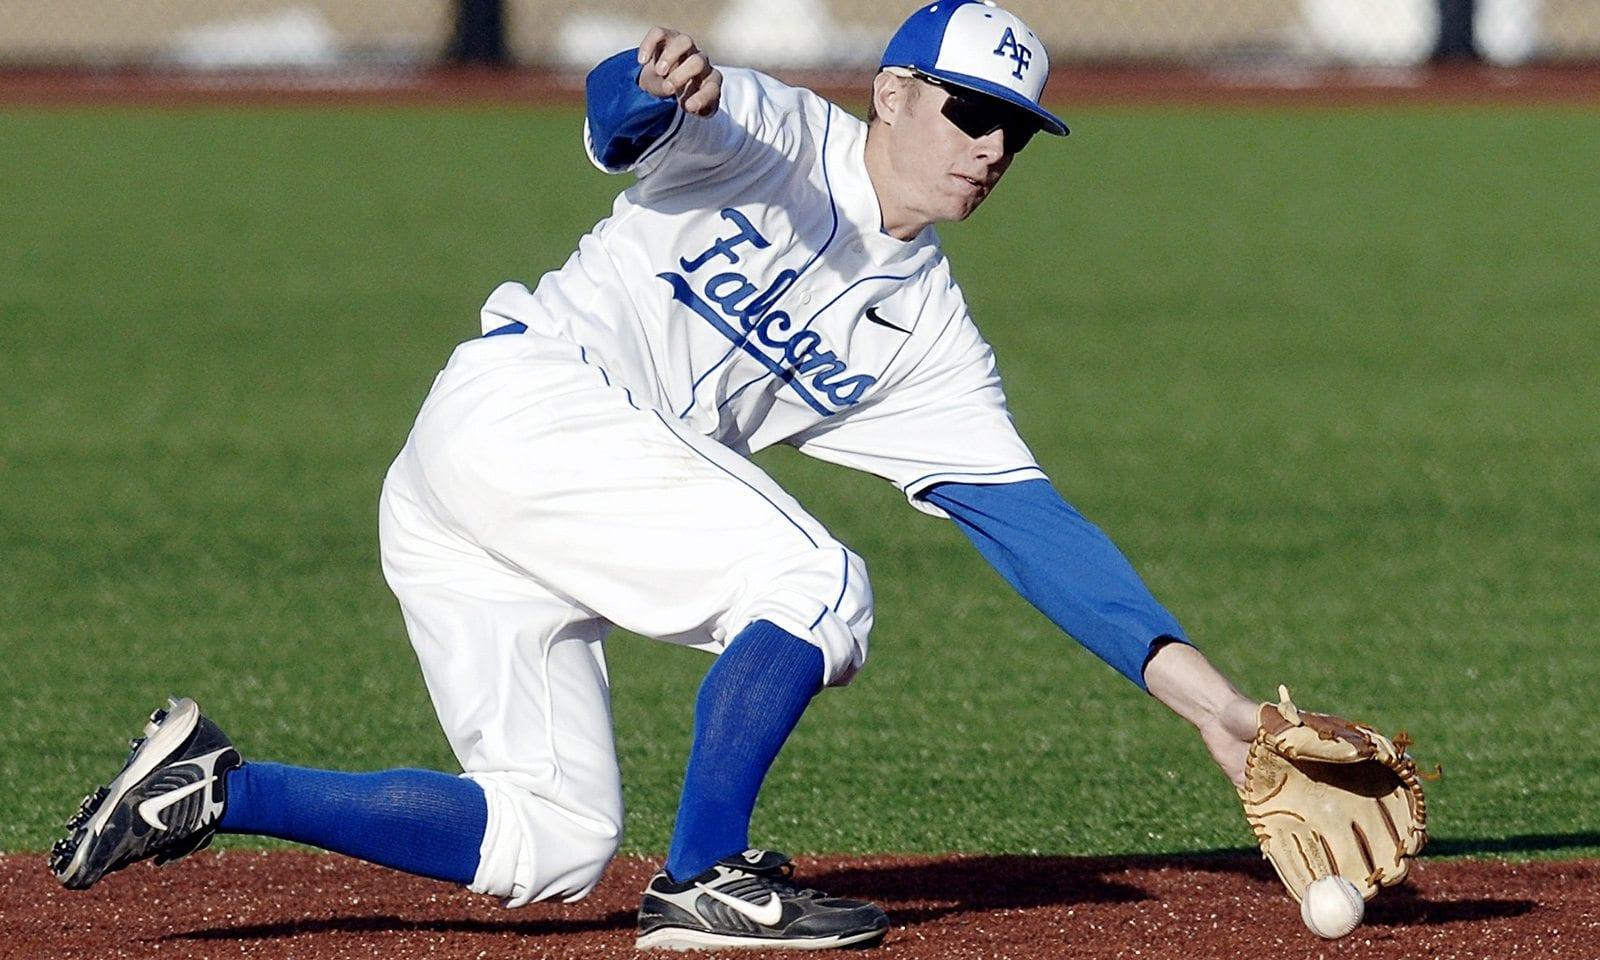 baseball-image-3